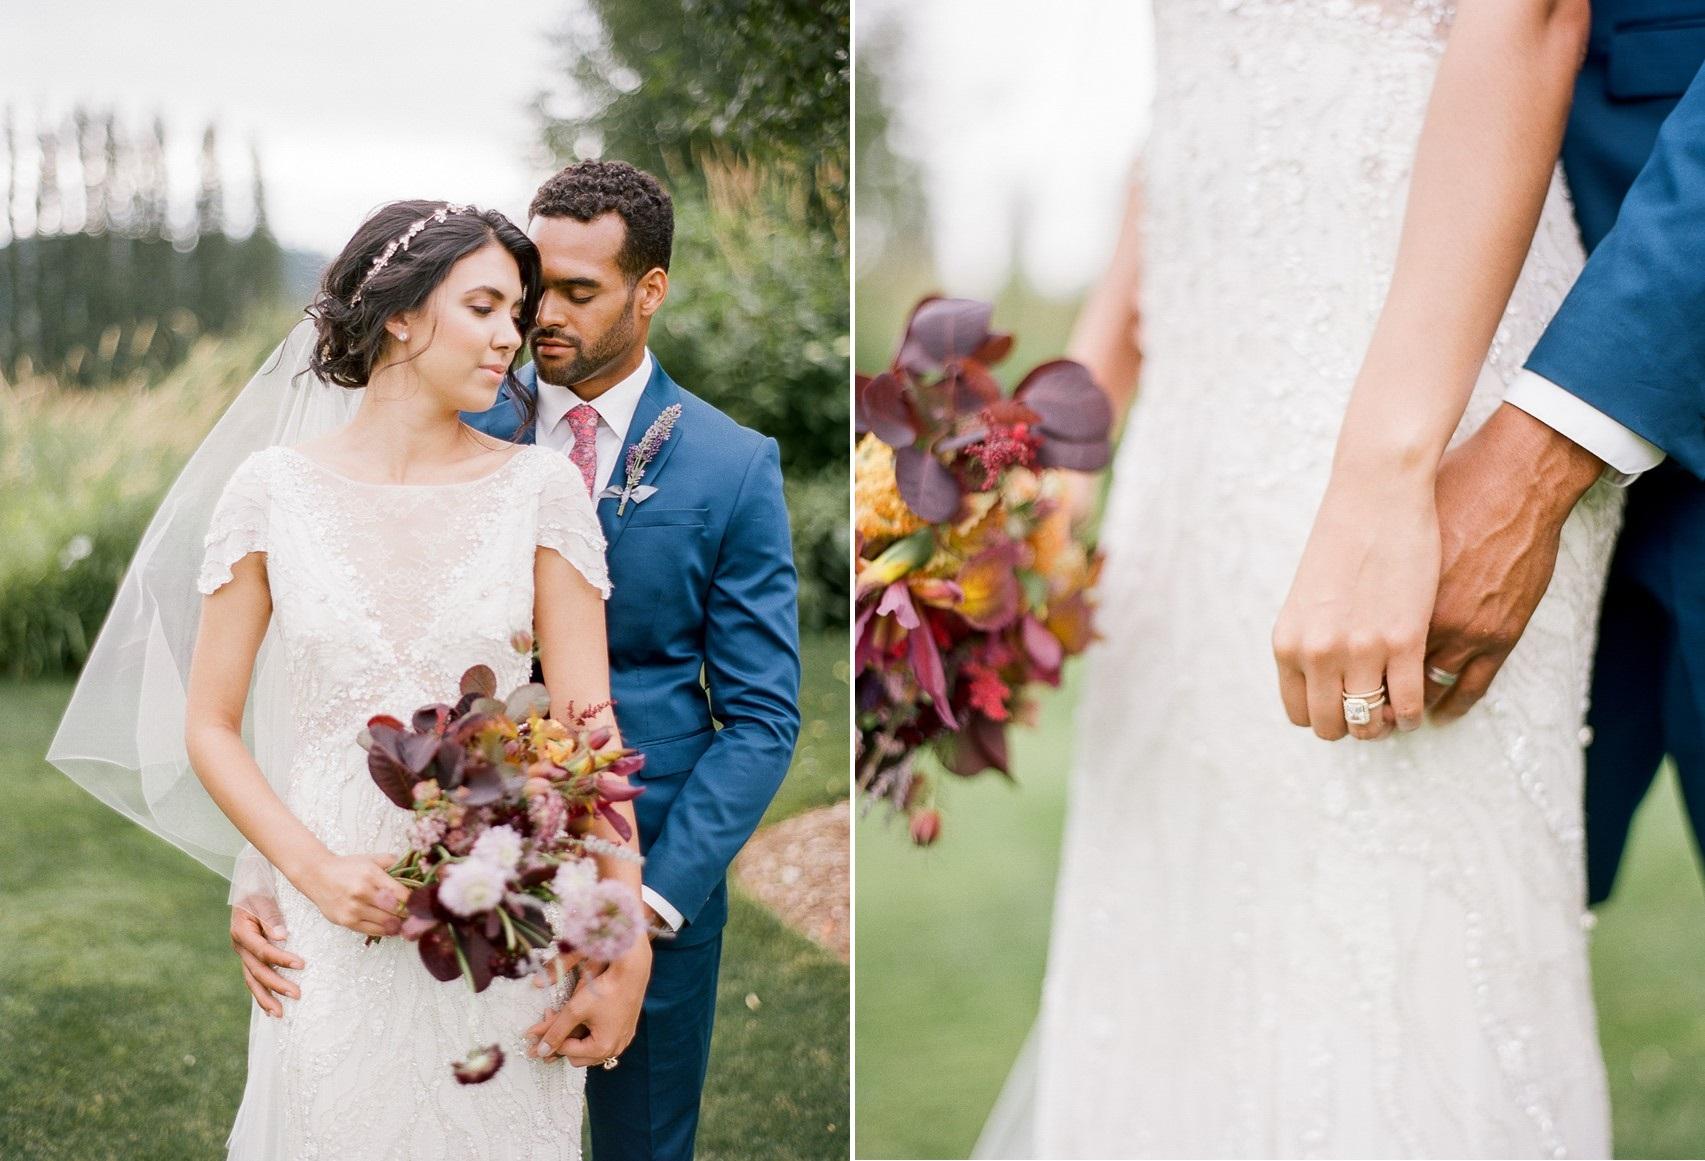 Woodinville Lavender Farm Wedding Inspiration